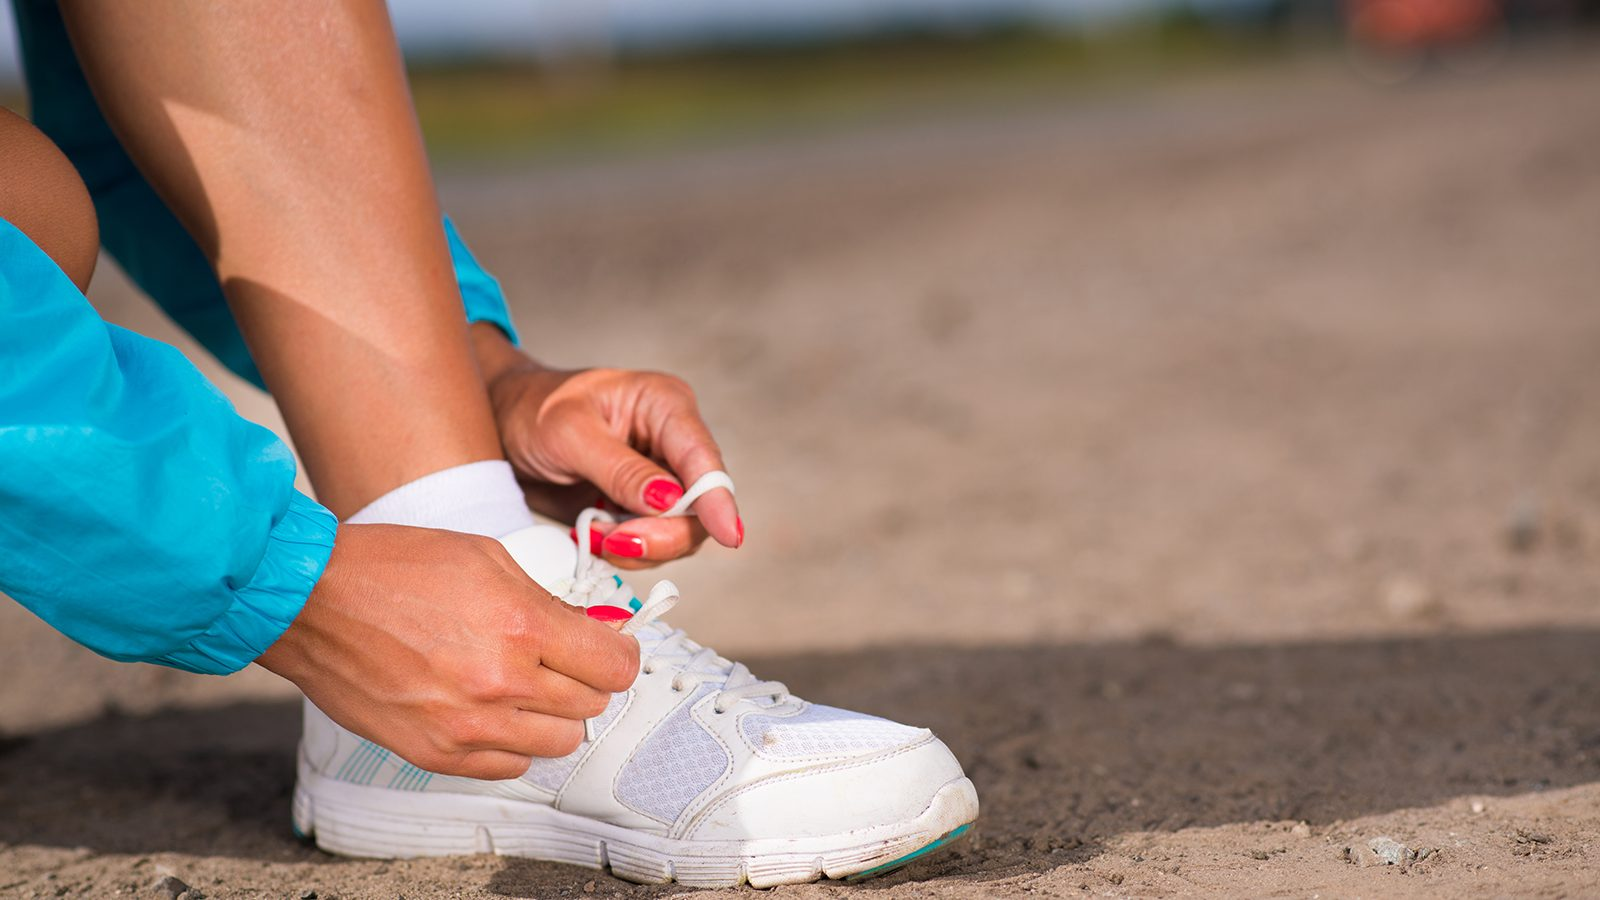 Motion beskytter hjernen mod stress